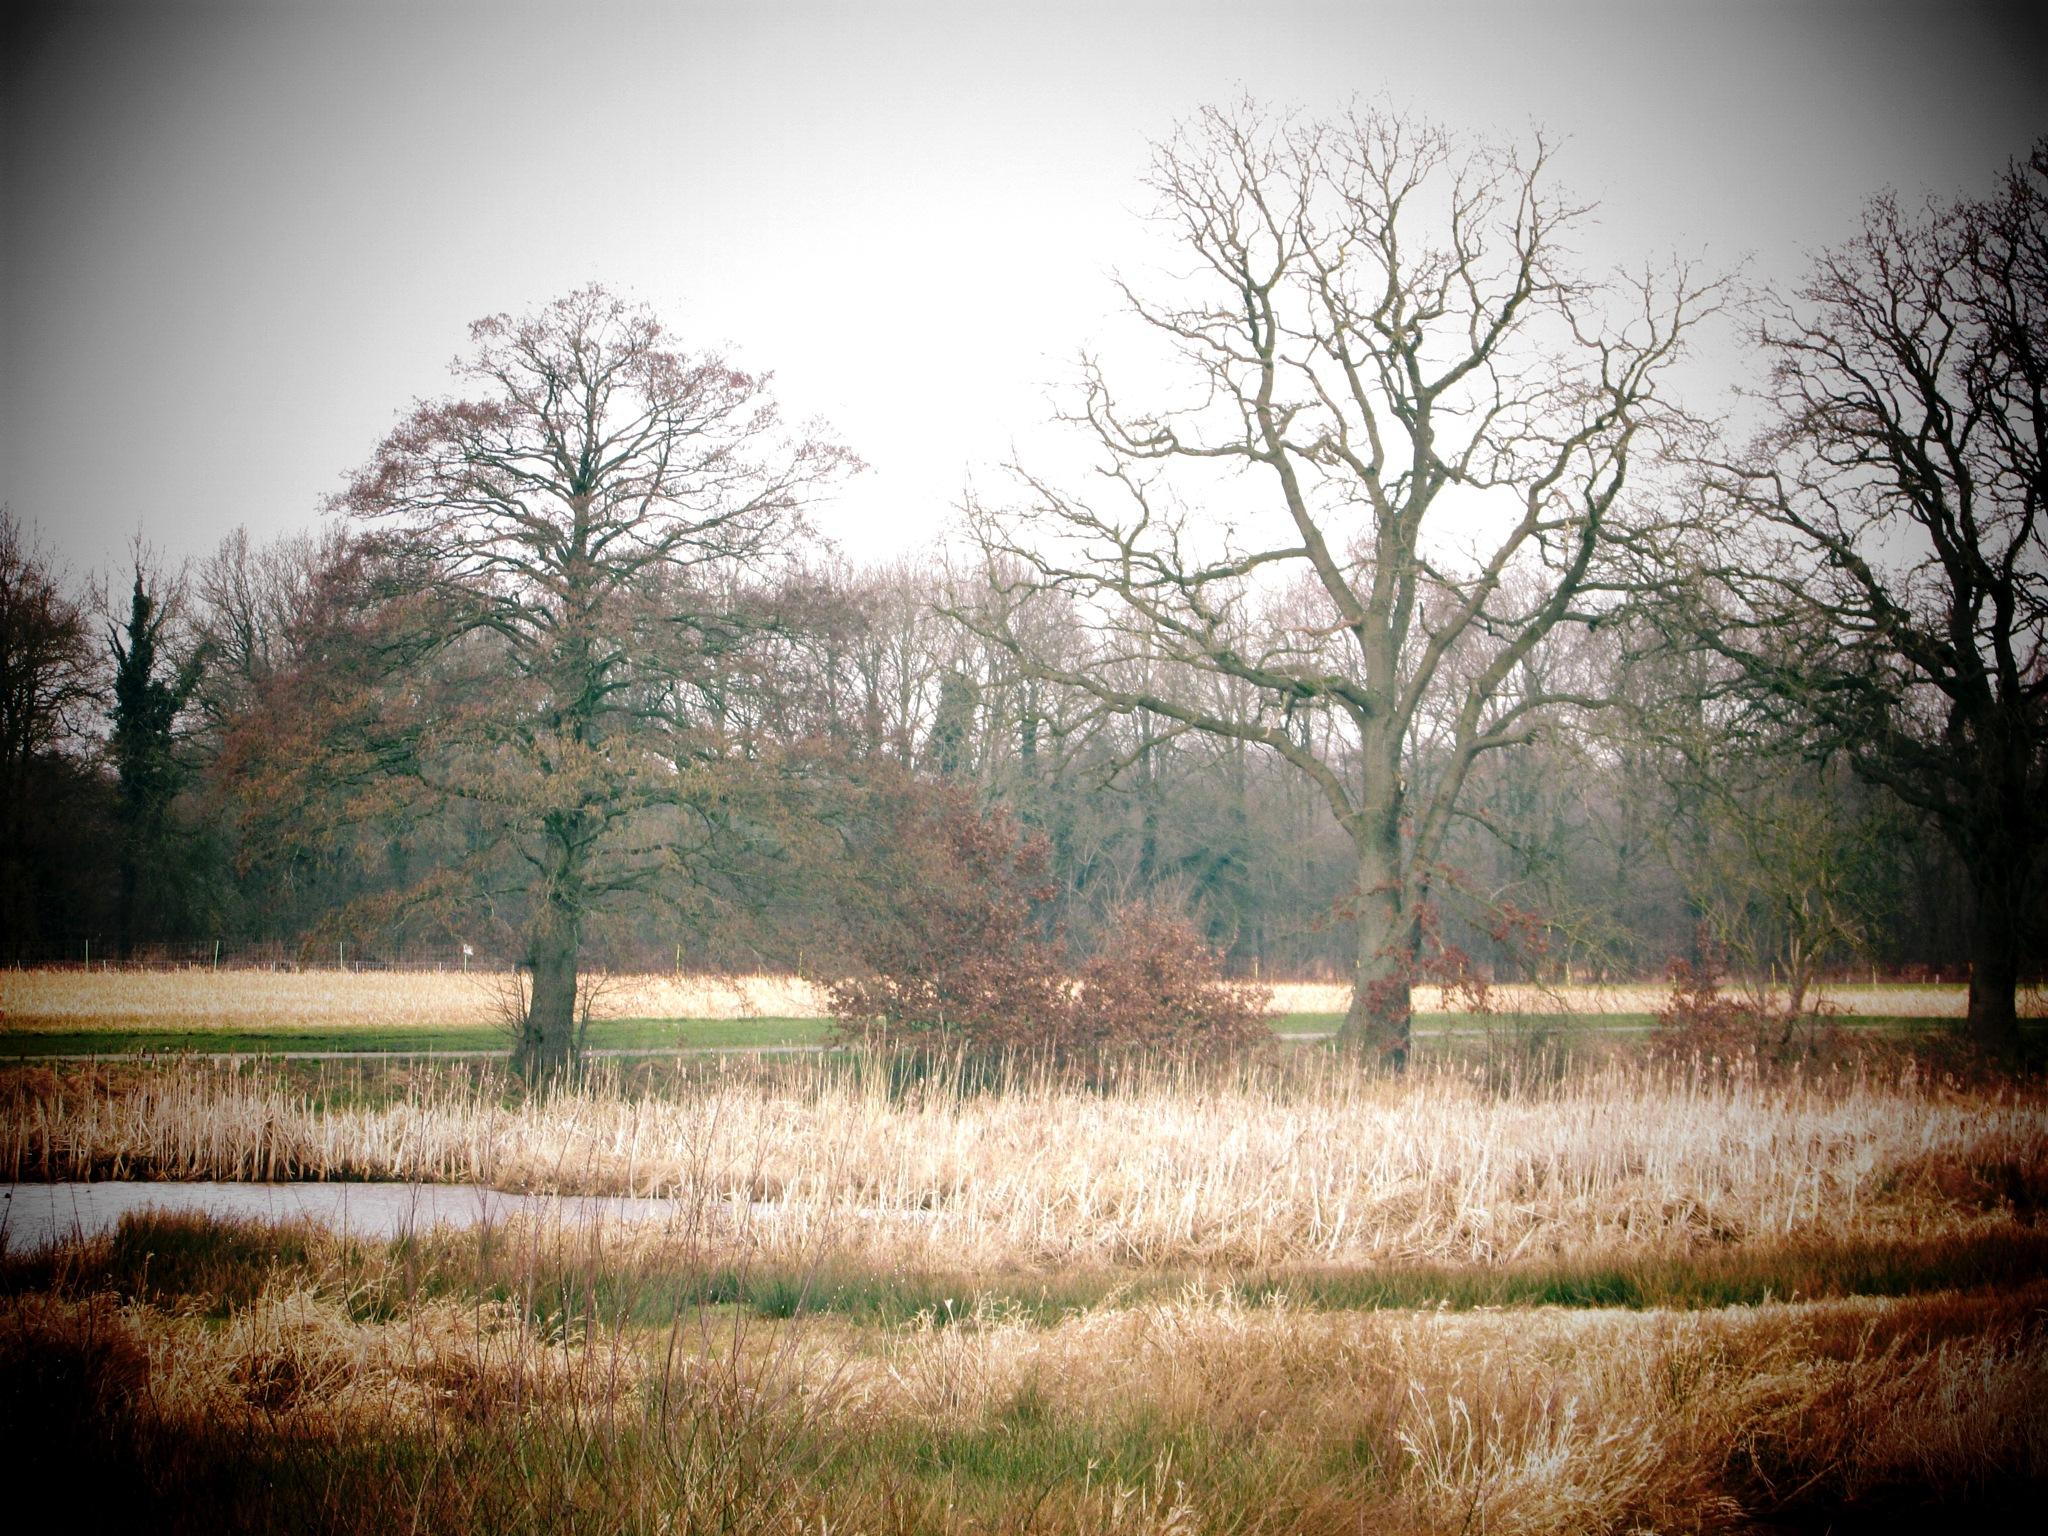 landscape 6 by gineke.sterenborg